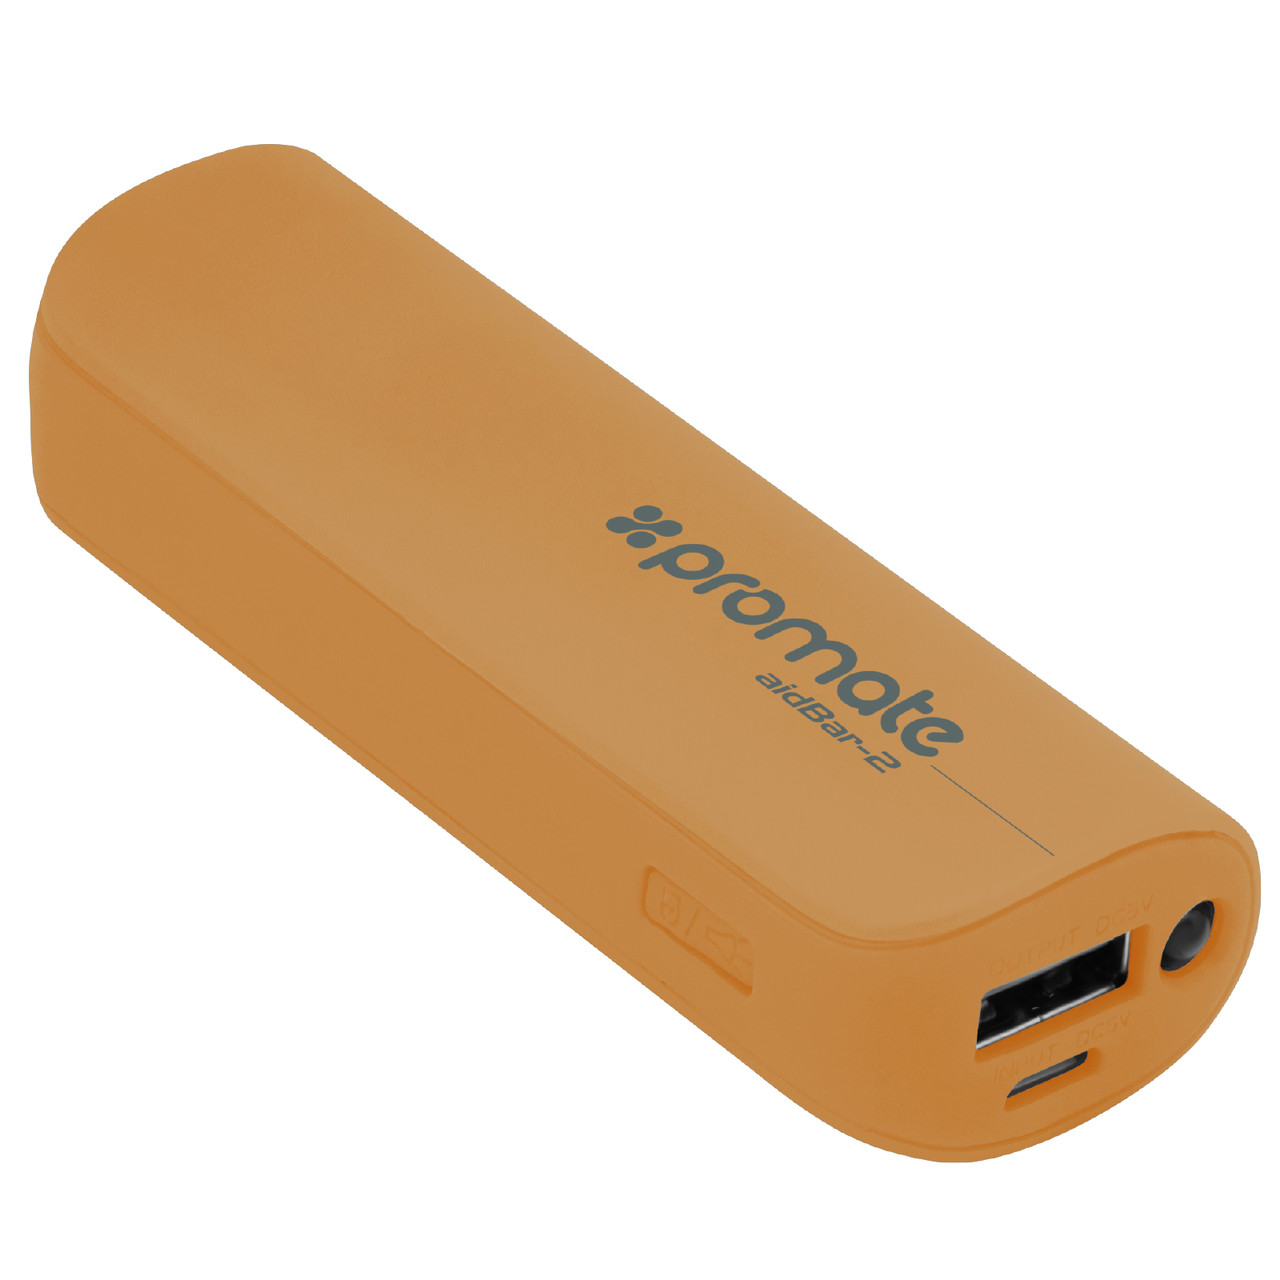 Универсальный аккумулятор Promate aidBar-2 Gold